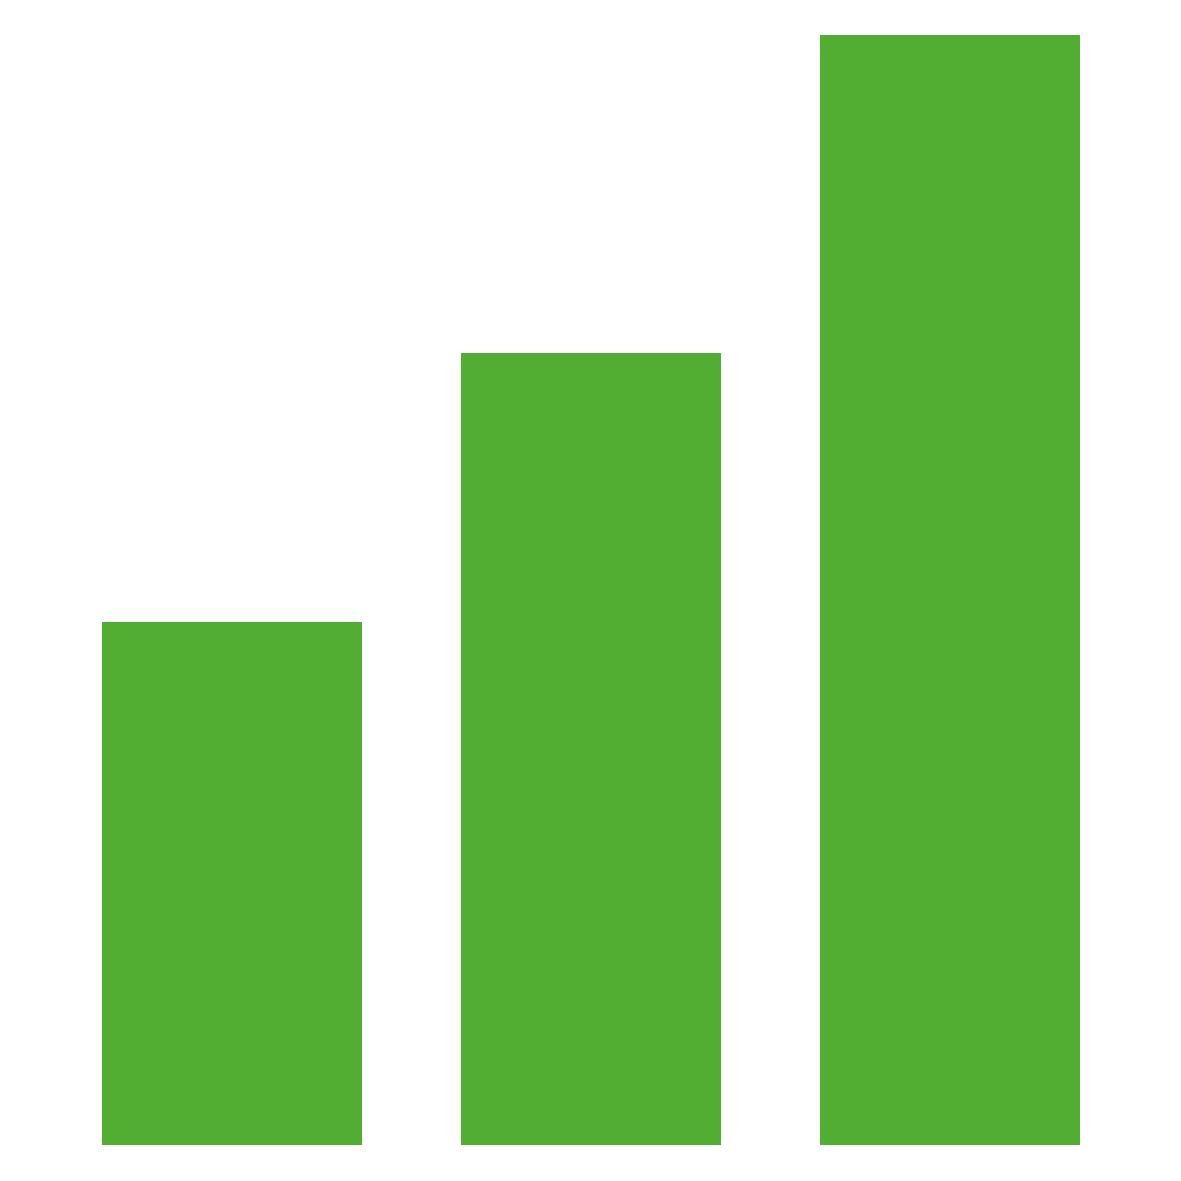 Evaluation Learning Green RGB - Alianzas y RSE